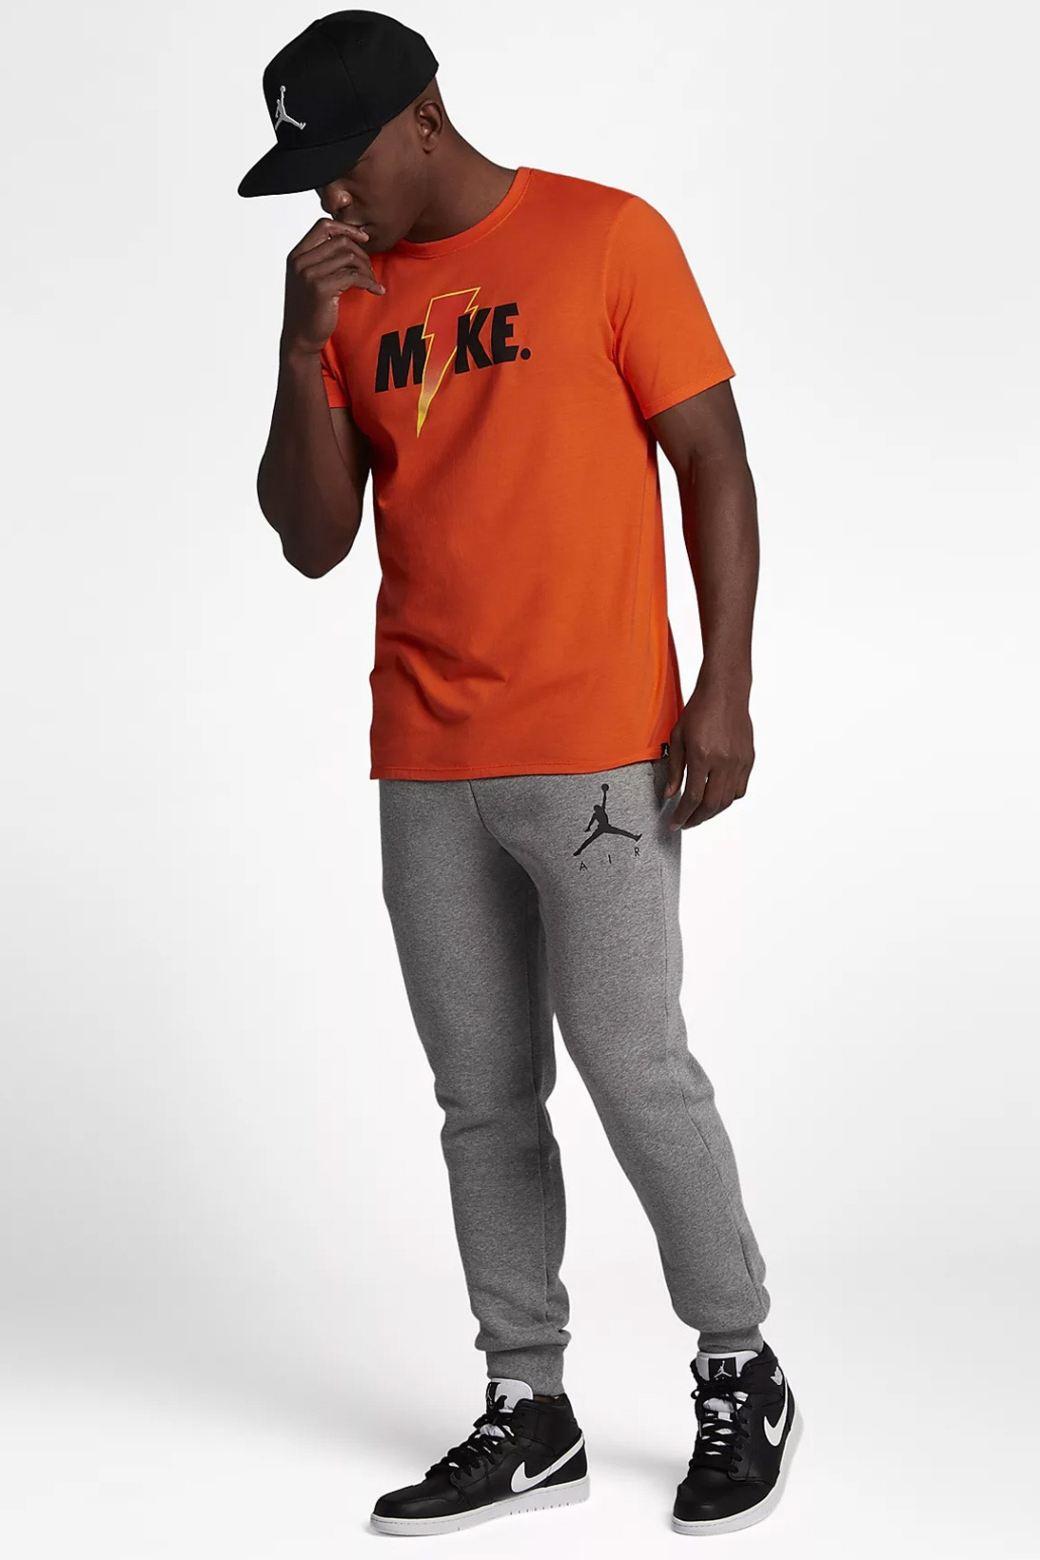 http3a2f2fhypebeast-com2fimage2f20172f112fnike-air-jordan-gatorade-apparel-collection-5